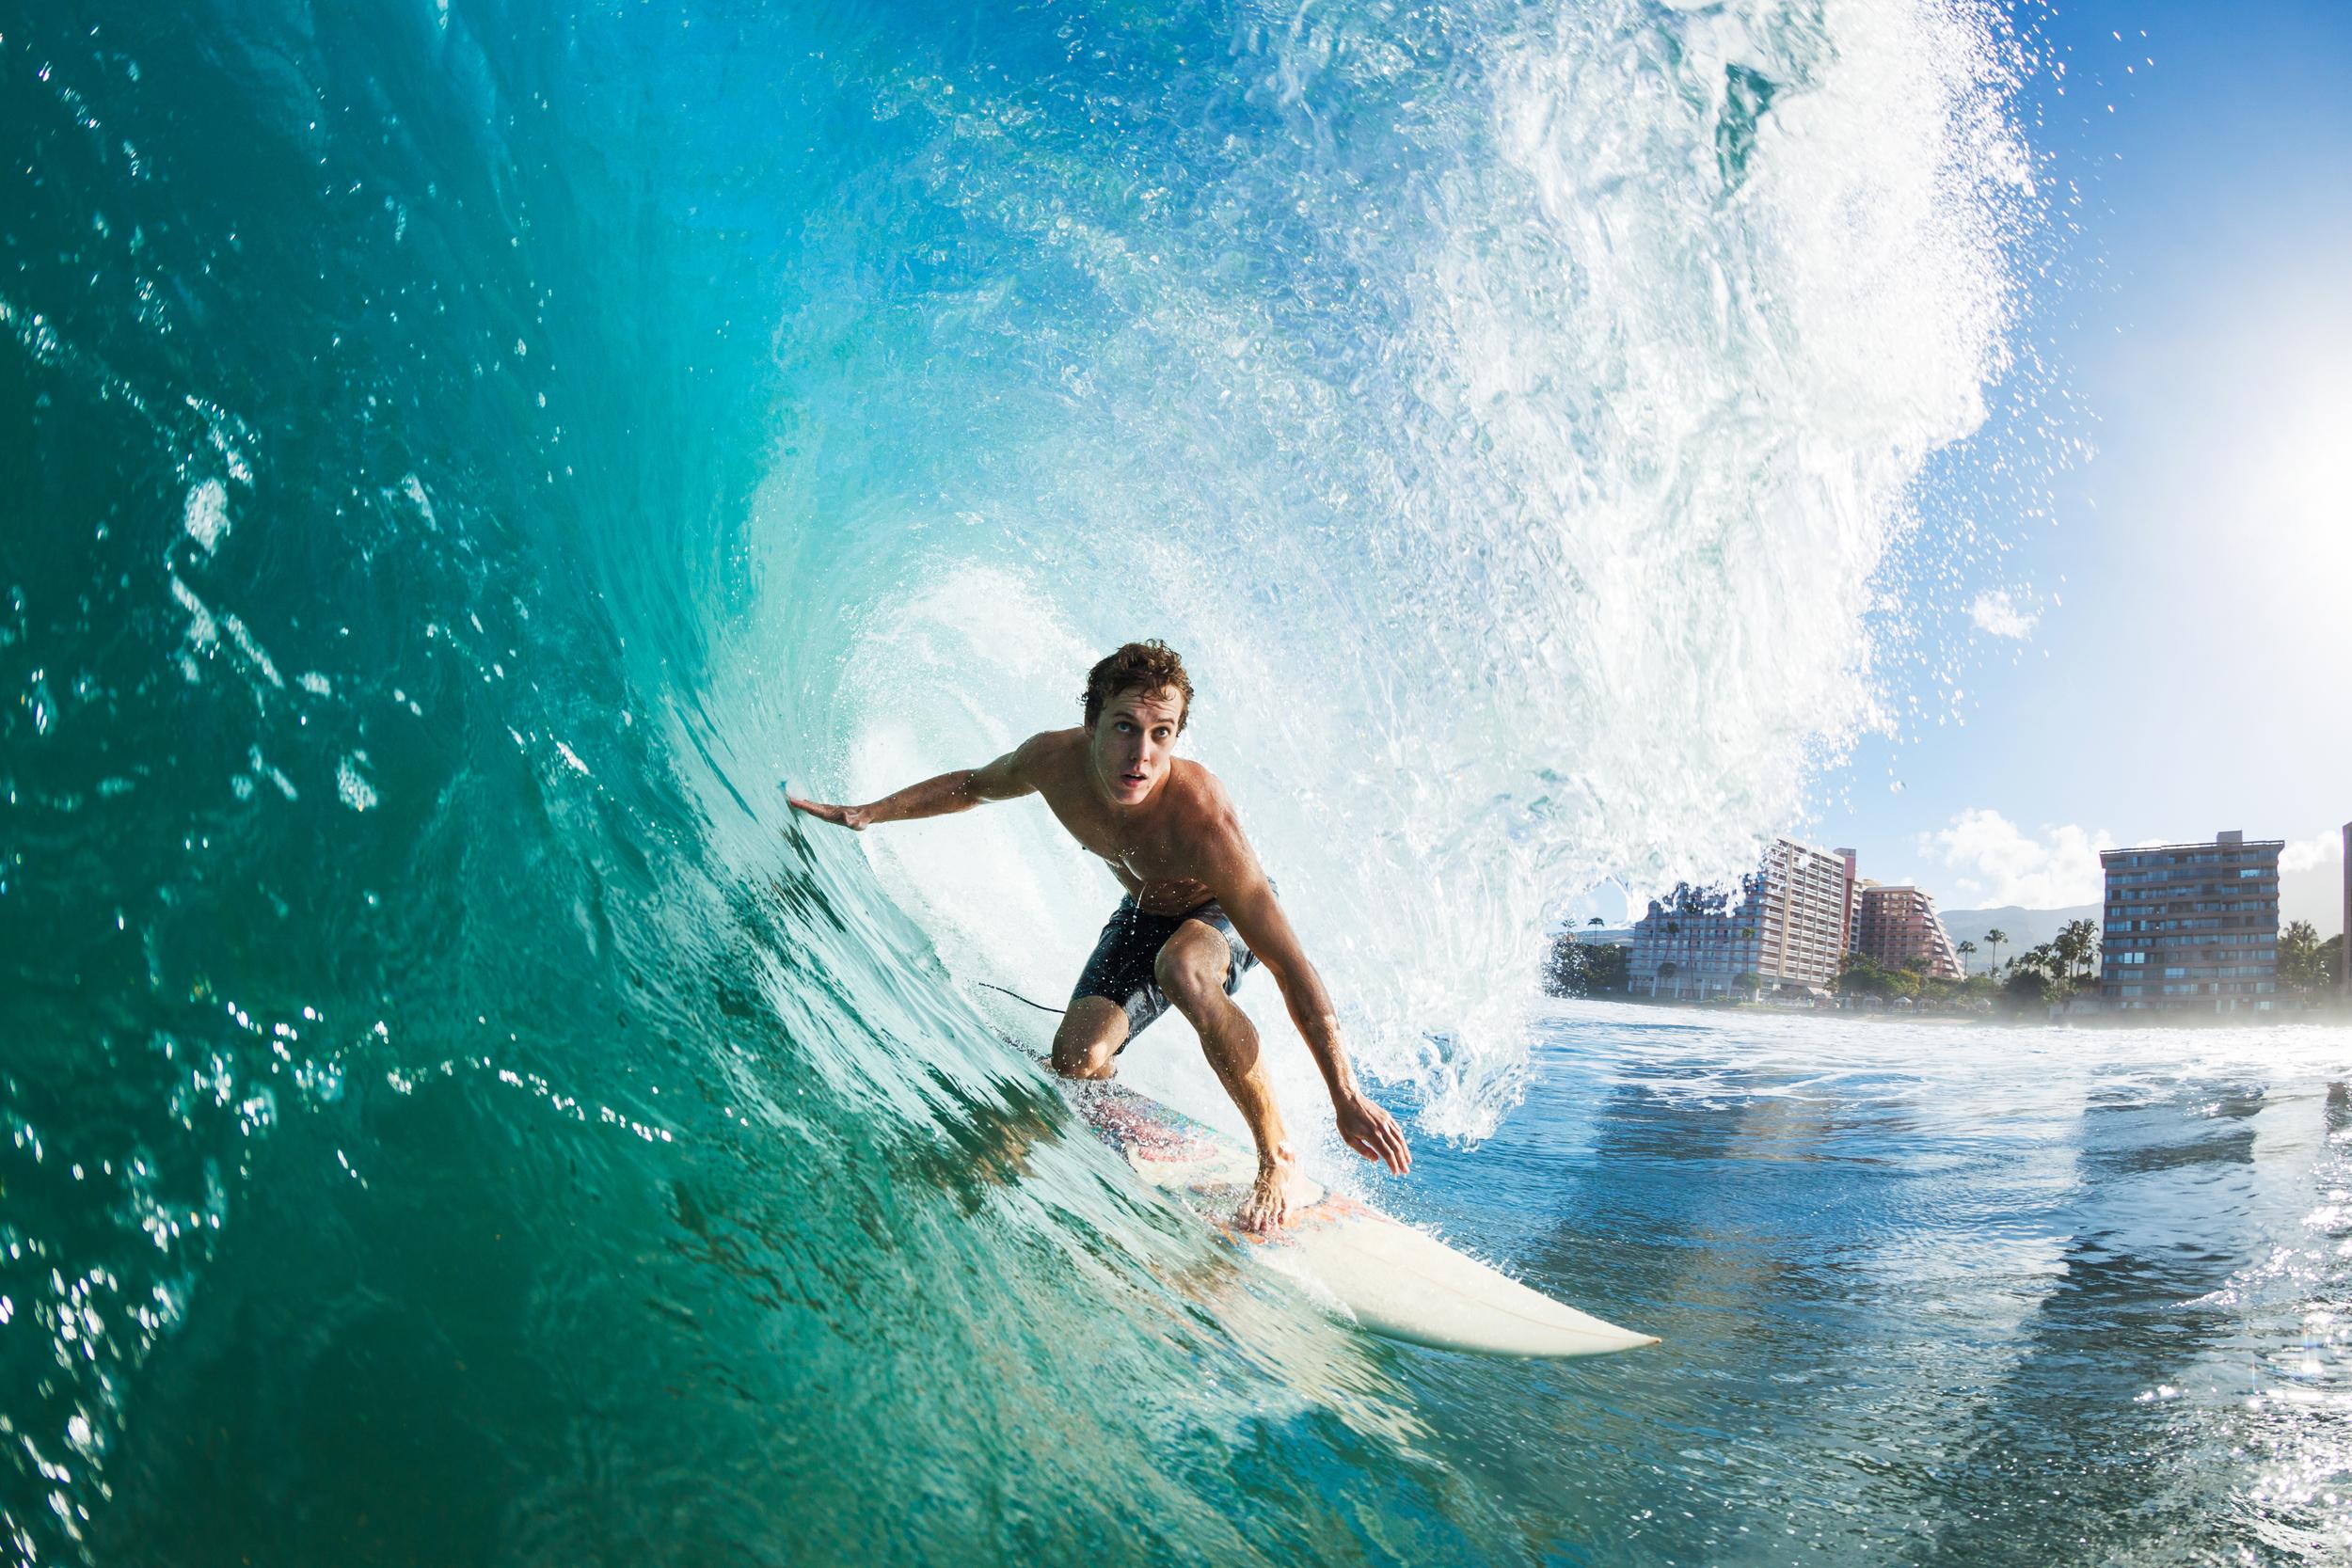 bigstock-Surfer-on-Blue-Ocean-Wave-Gett-47236375.jpg